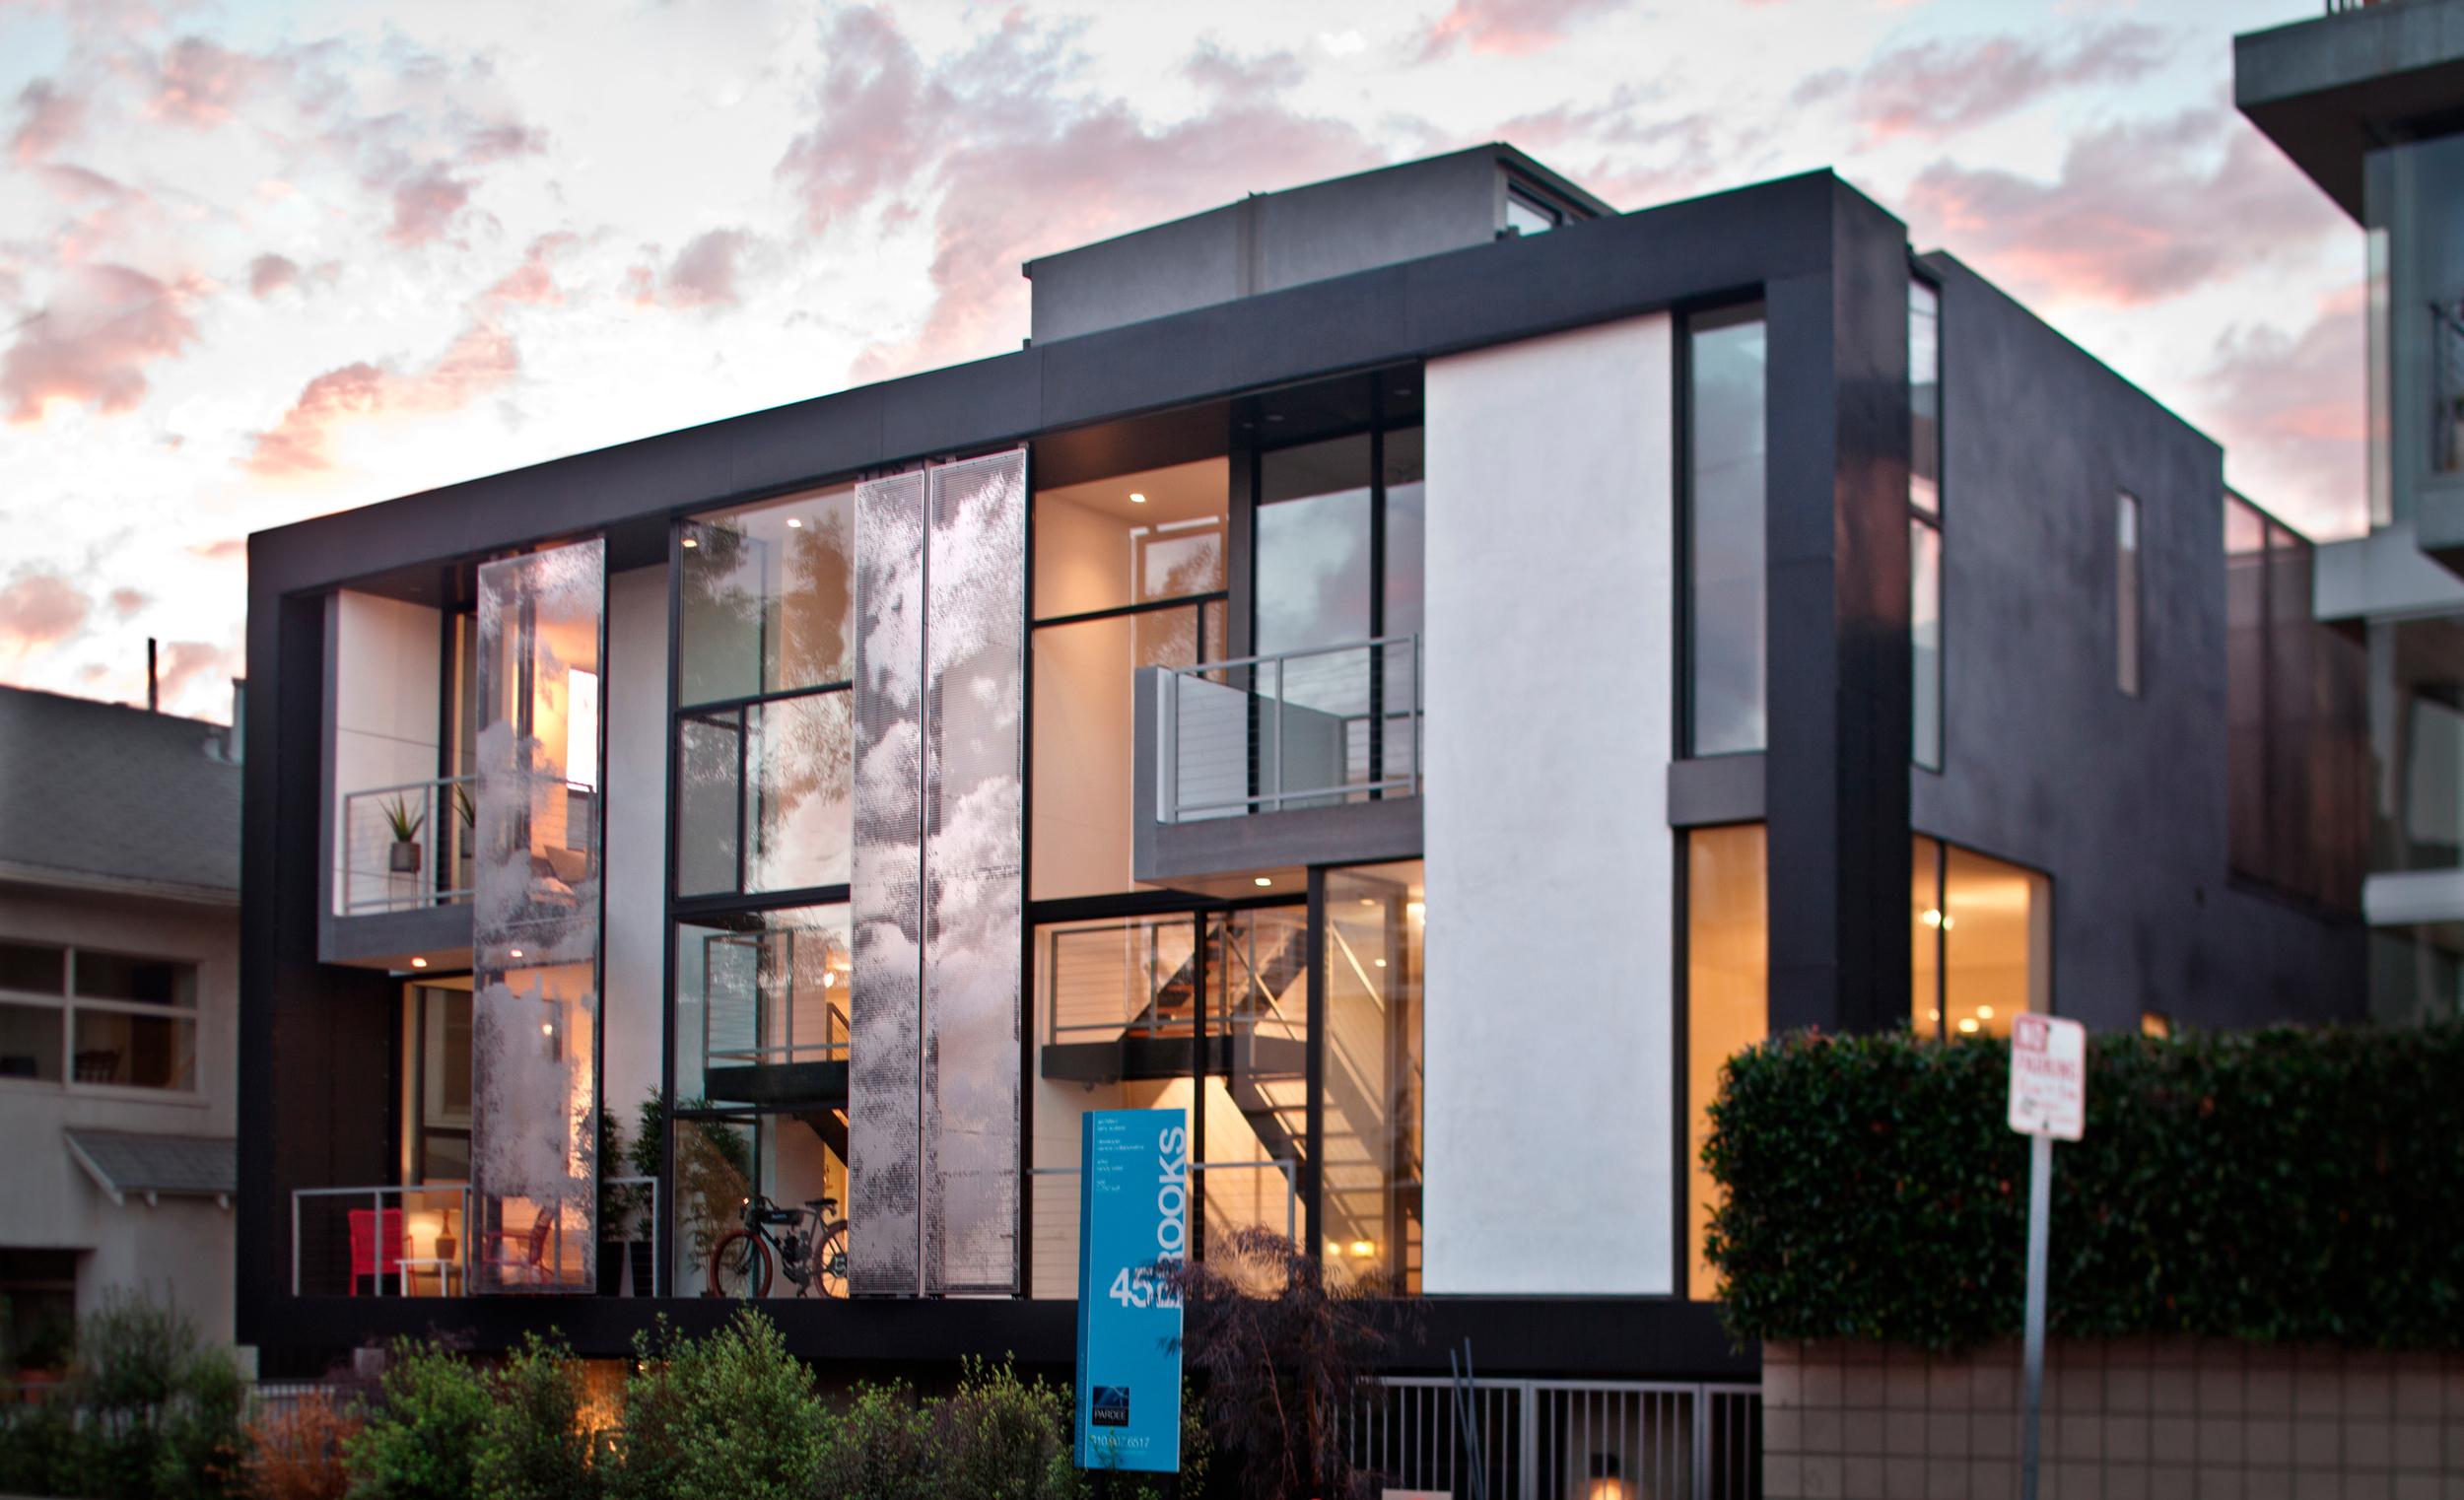 43/45 Brooks Ave   ., Venice, CA, collaboration with Brooks + Scarpa Architects